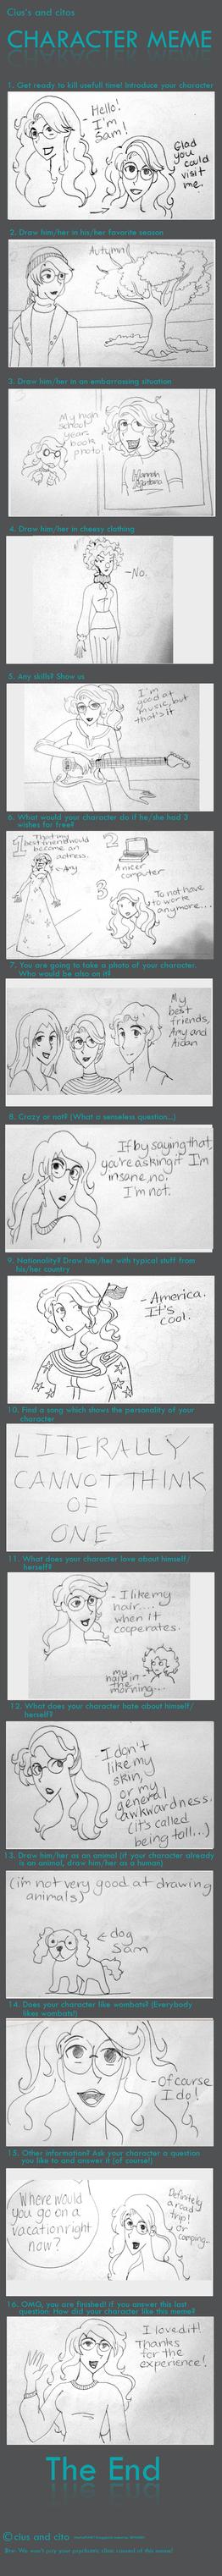 Character Meme by OakEvolution